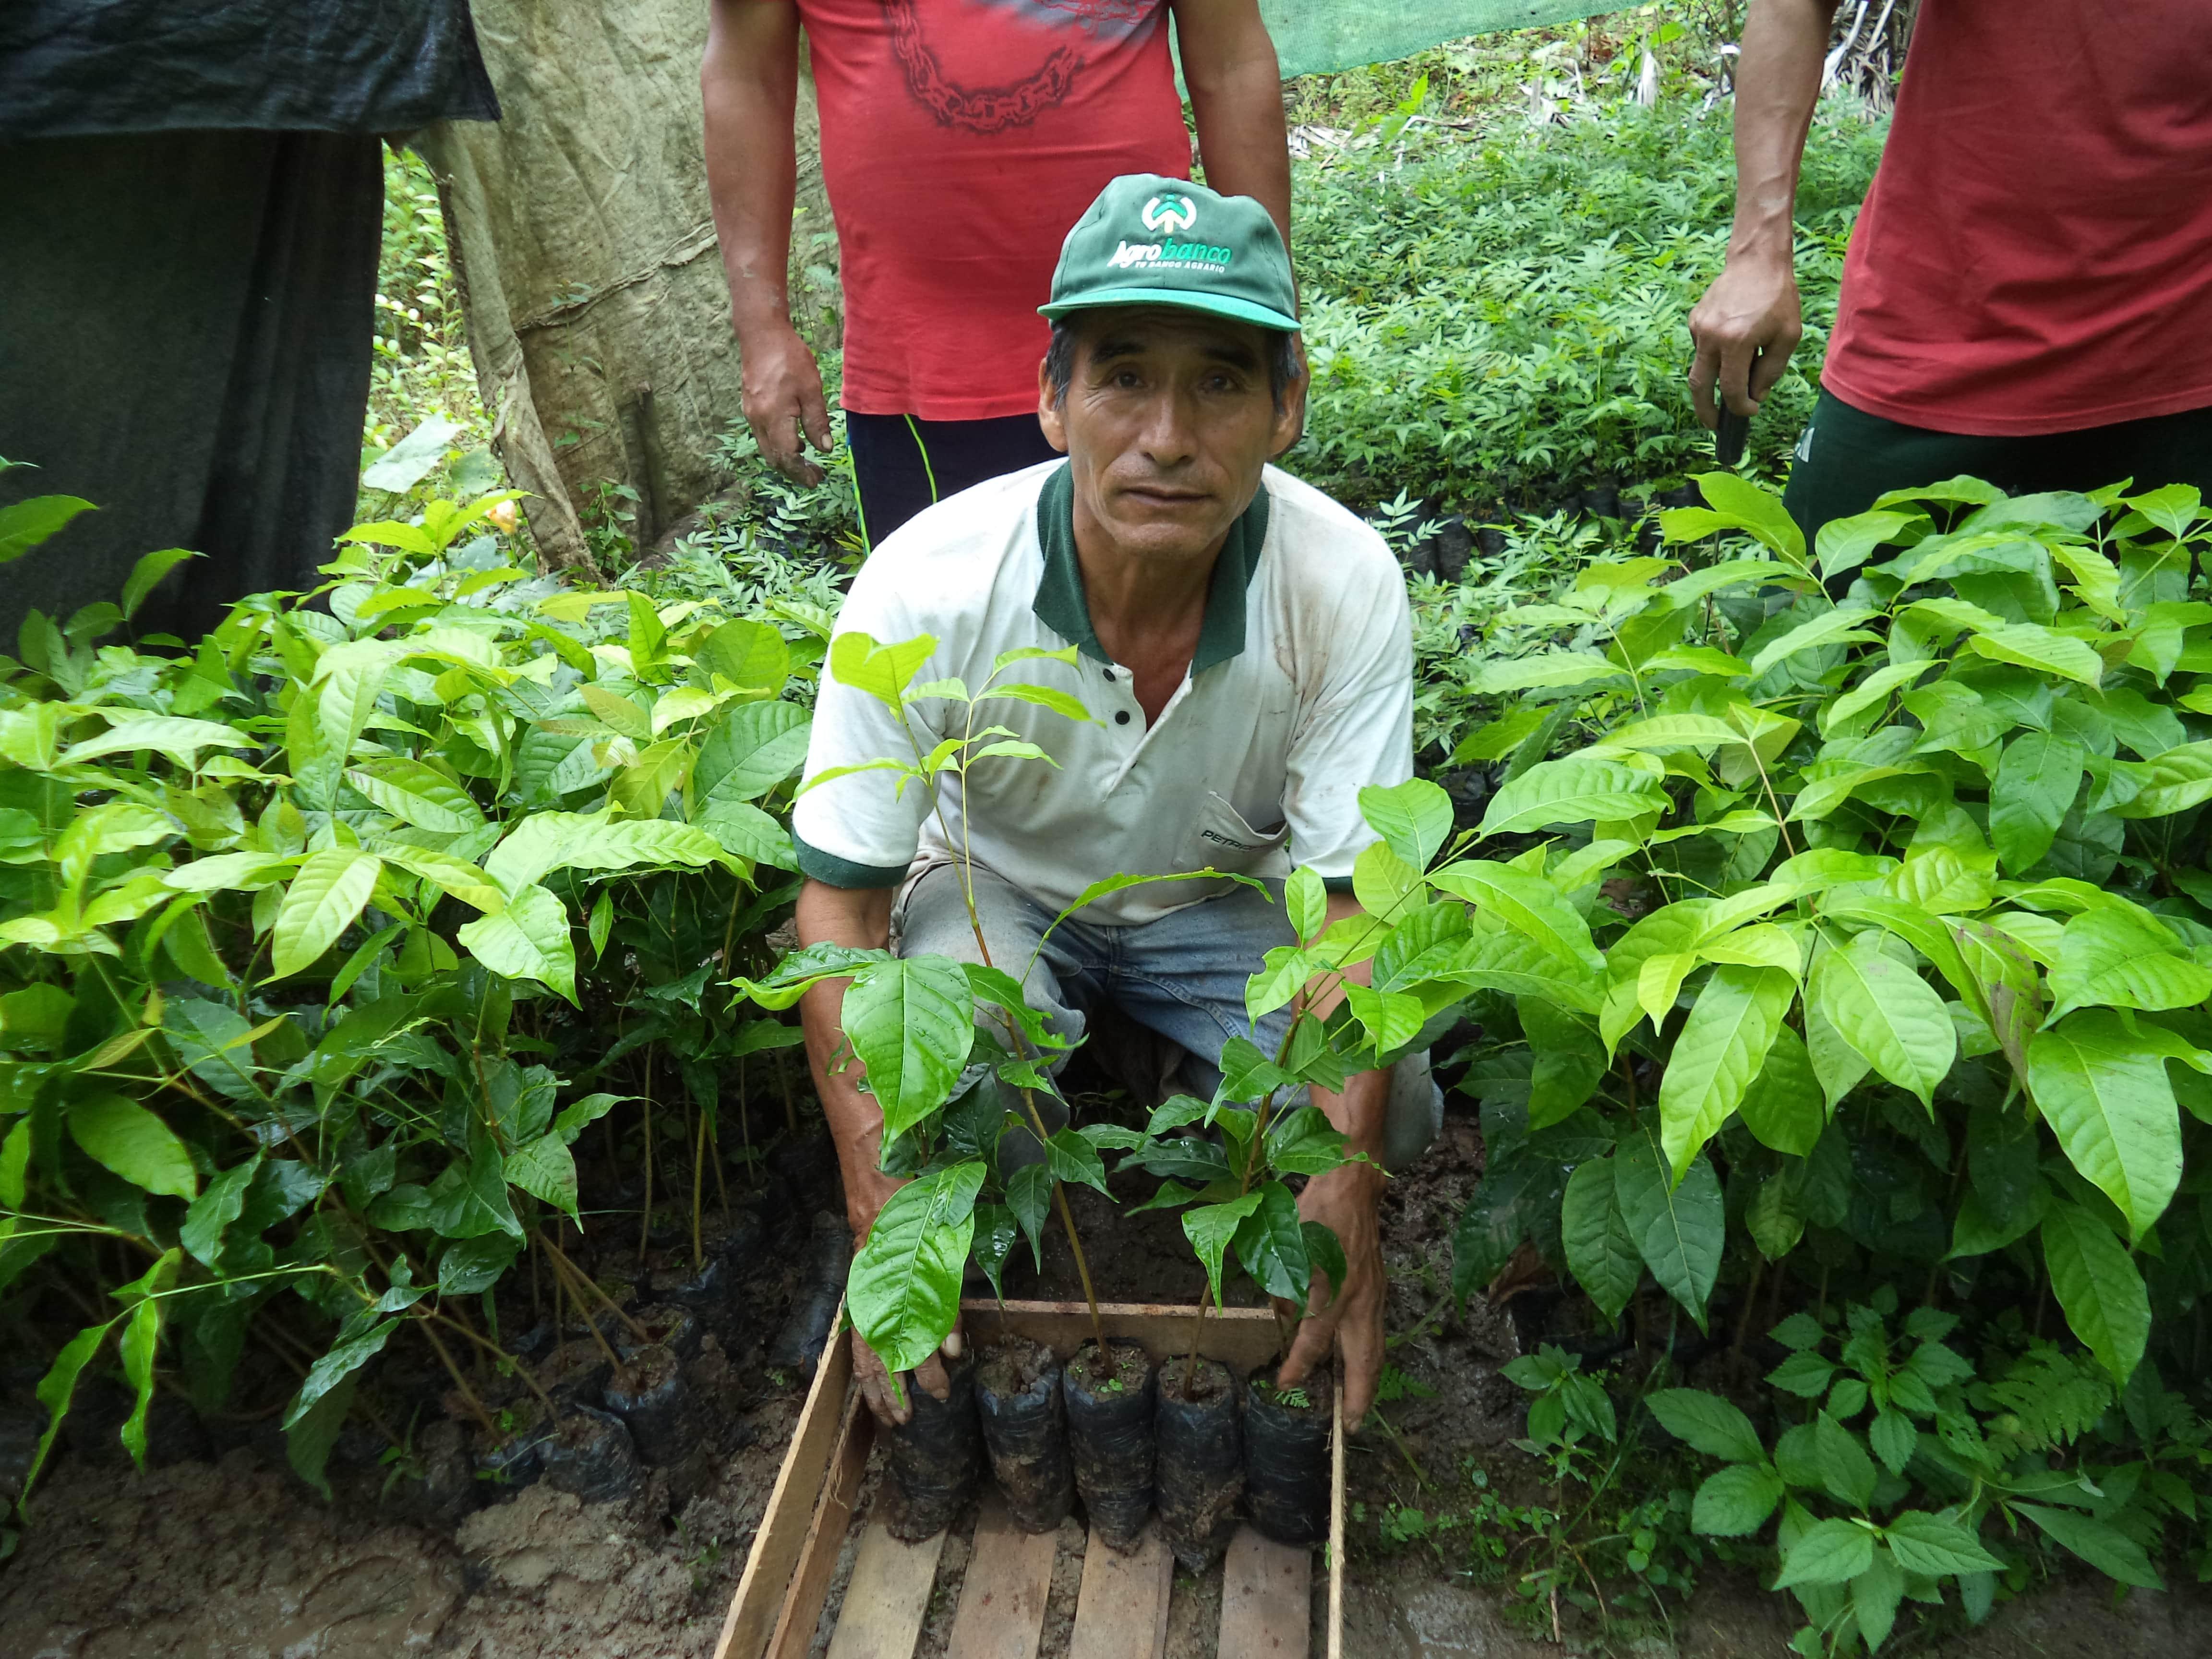 Pérou - Reforestacion Selva Central ©Frank Celi Montero 2017  (11).JPG